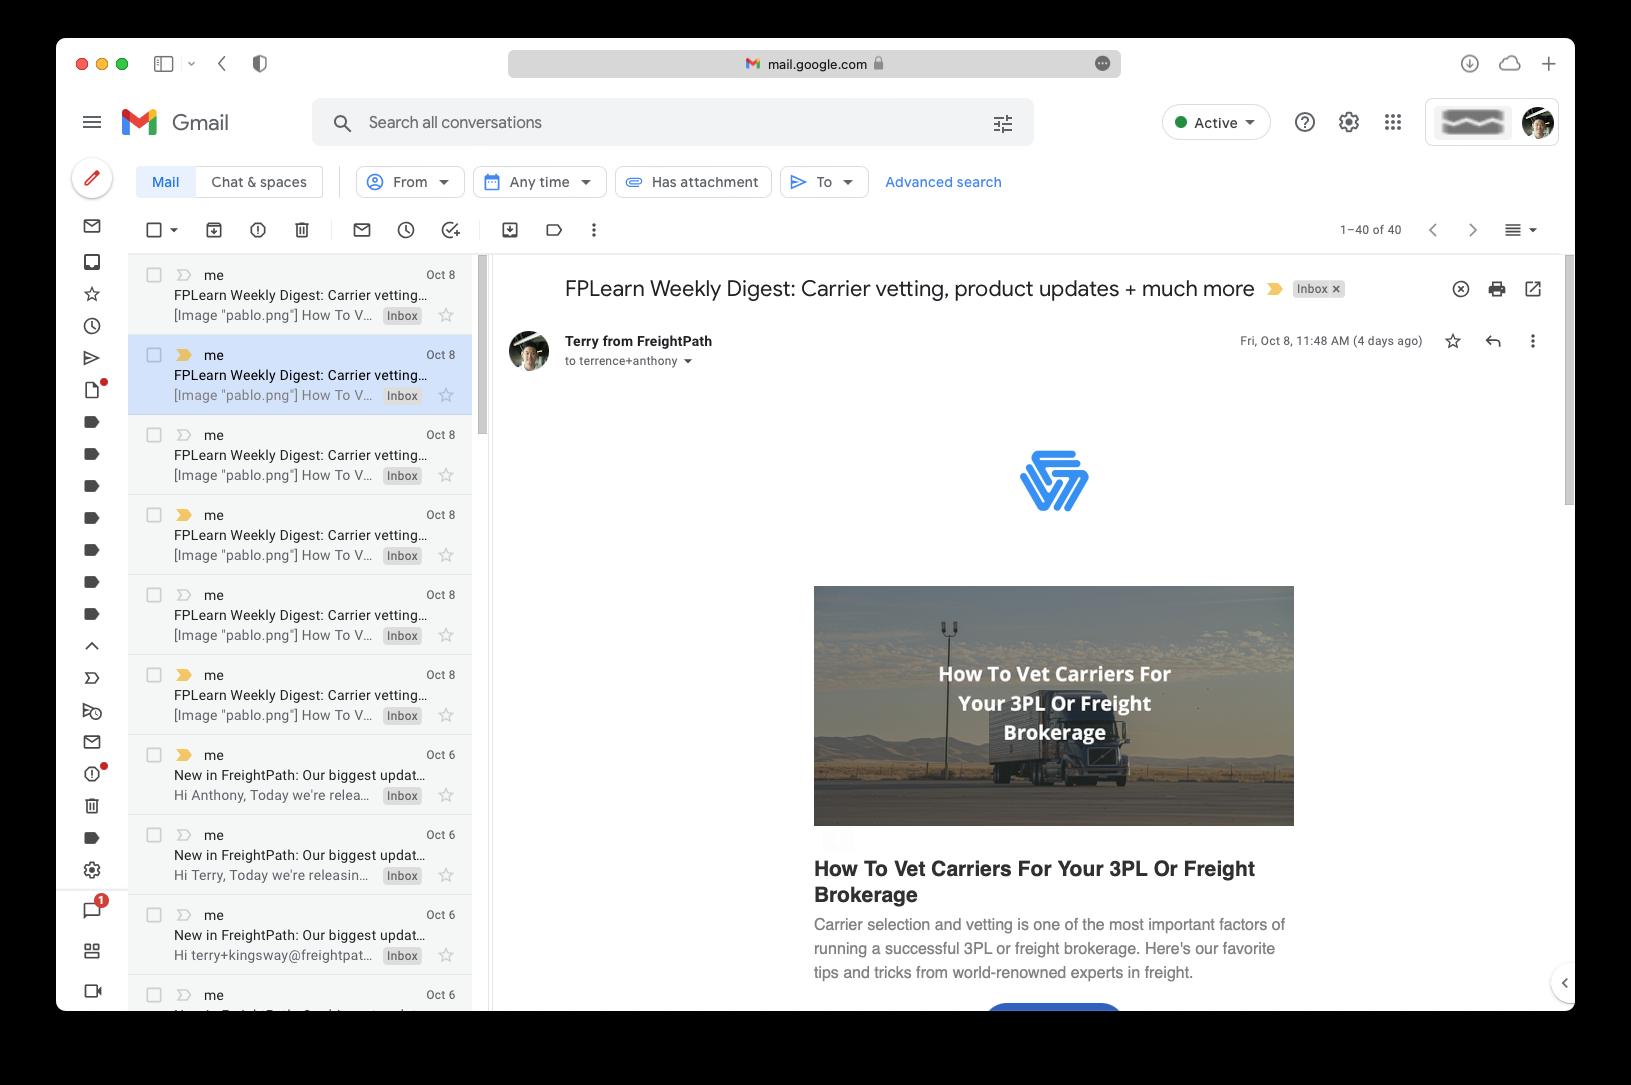 gmail email printing screenshot